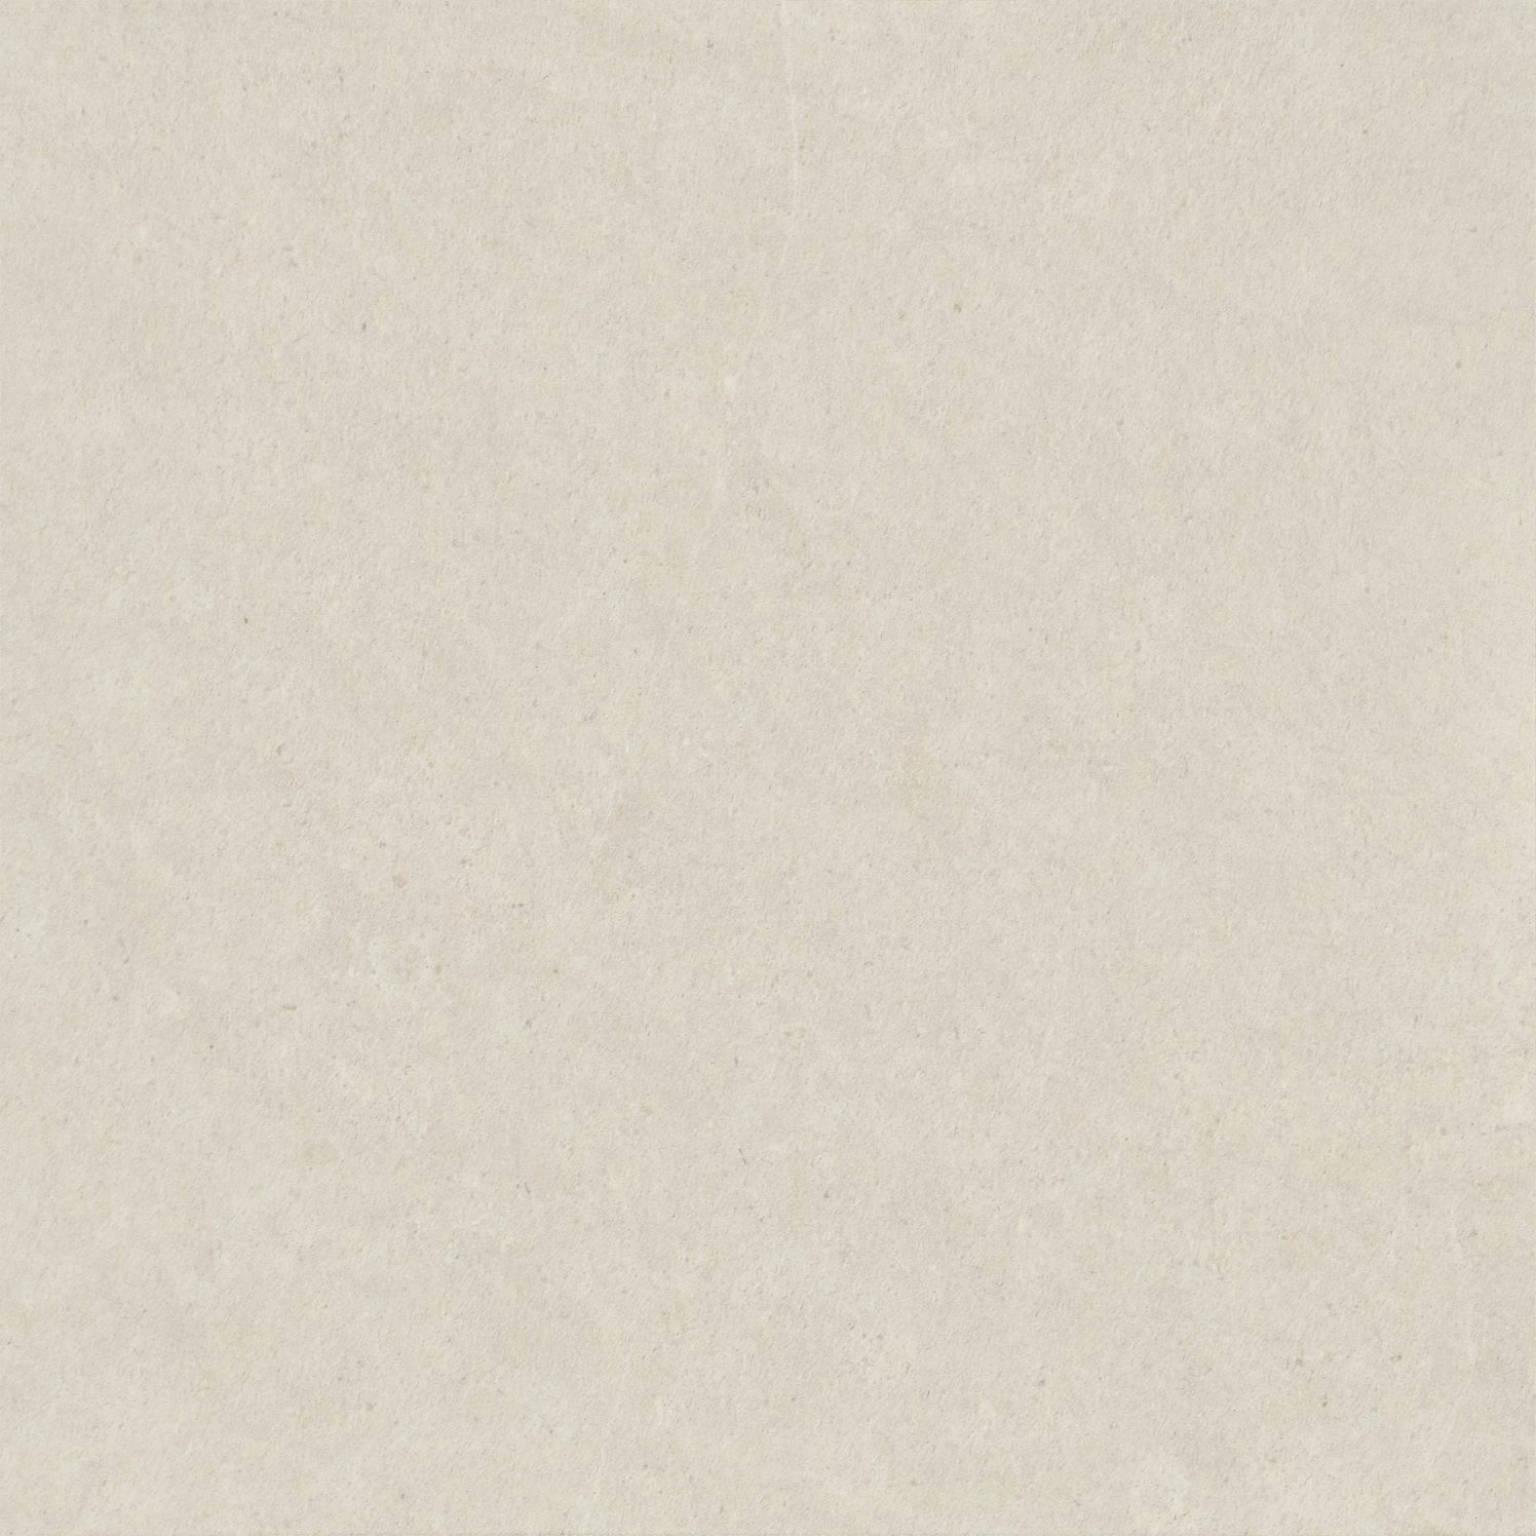 Qstone Antislip Ivory 60x60 | Newker